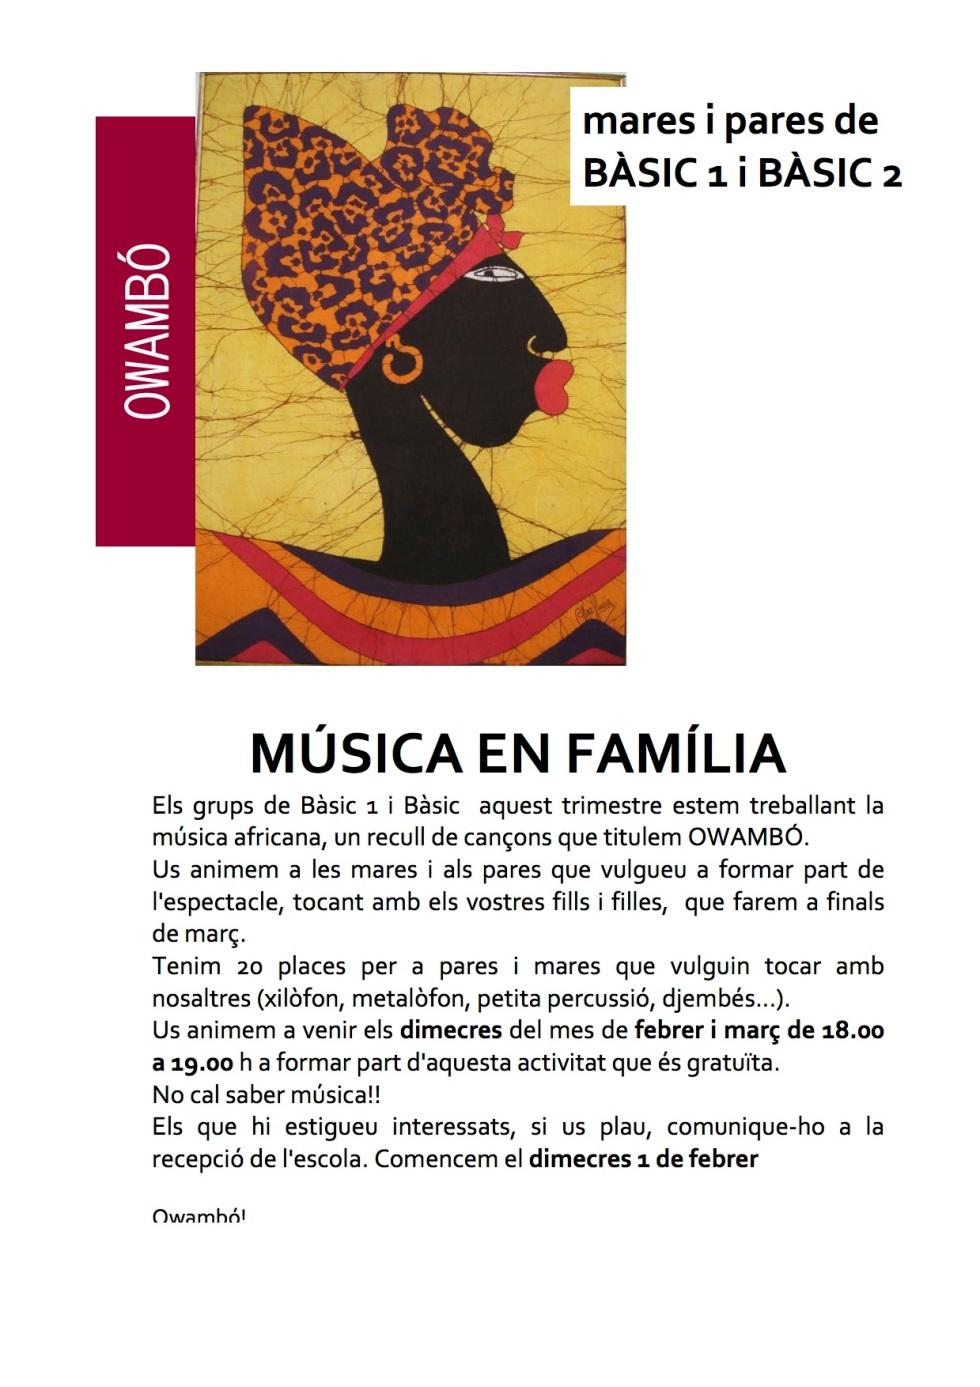 carta-families-owambo